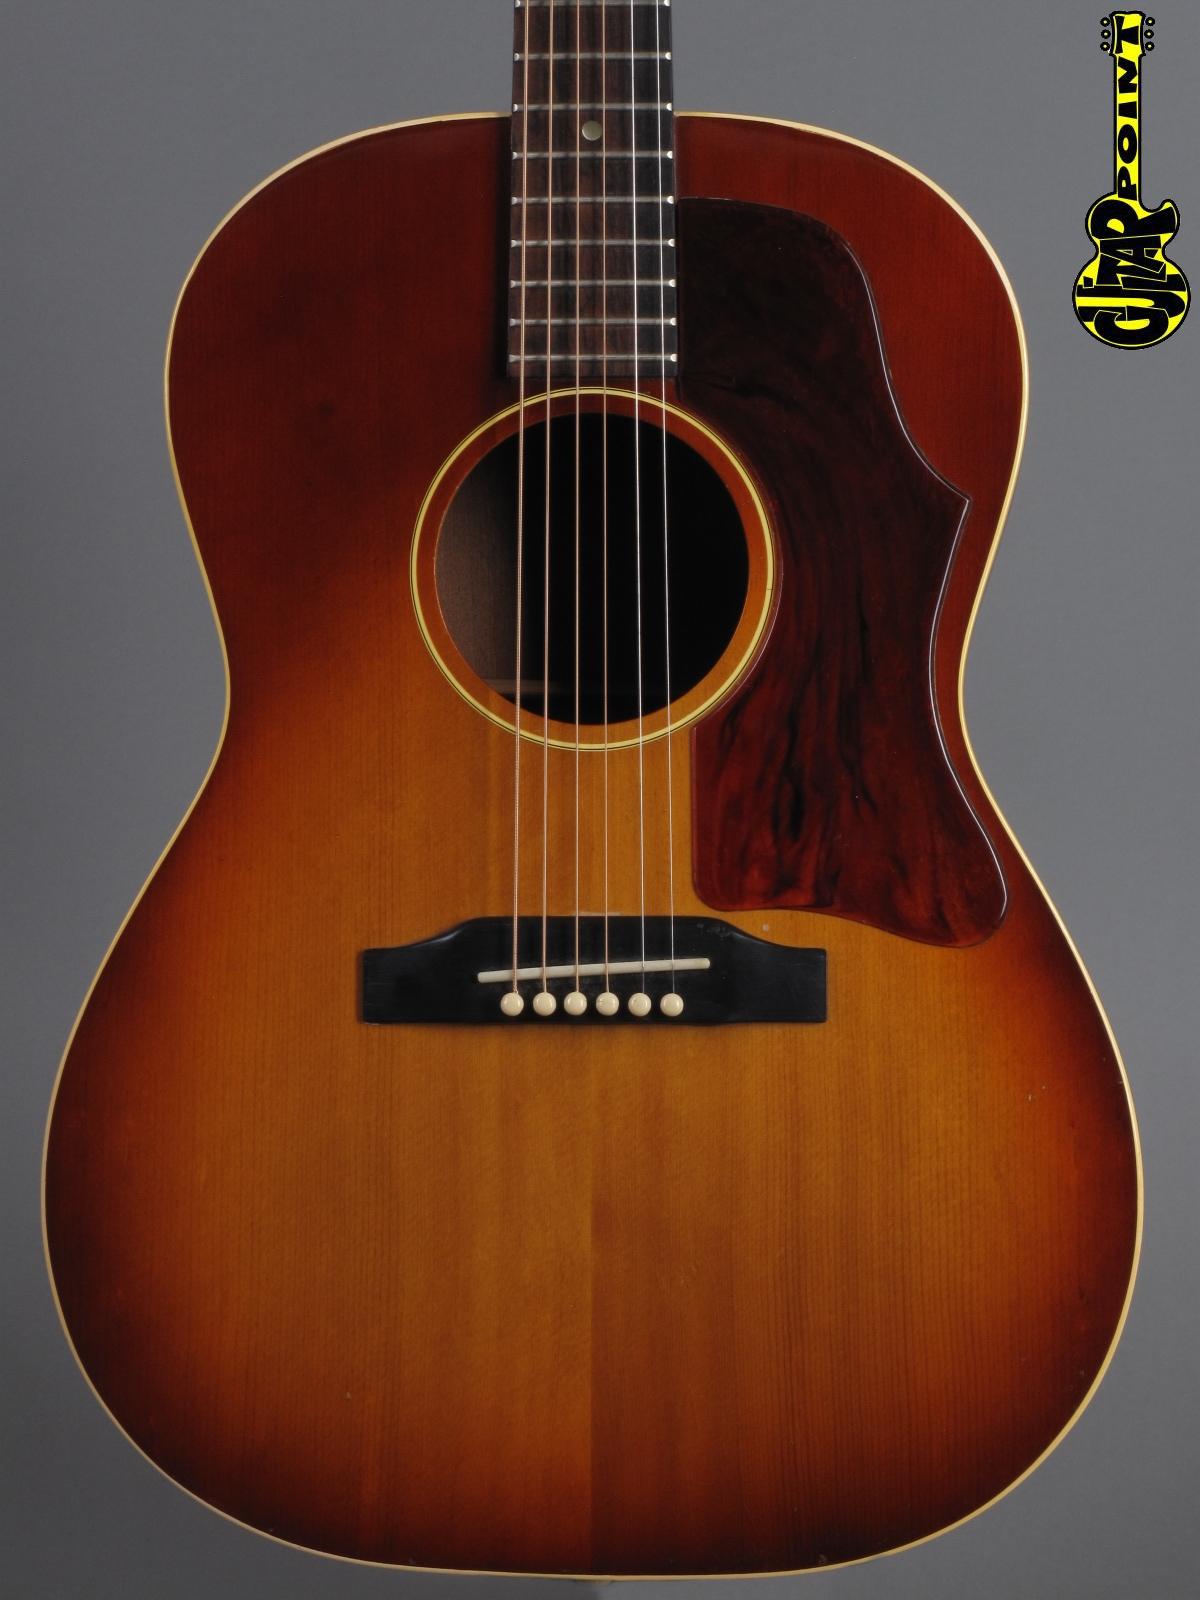 1967 Gibson LG-1 - Cherry Sunburst